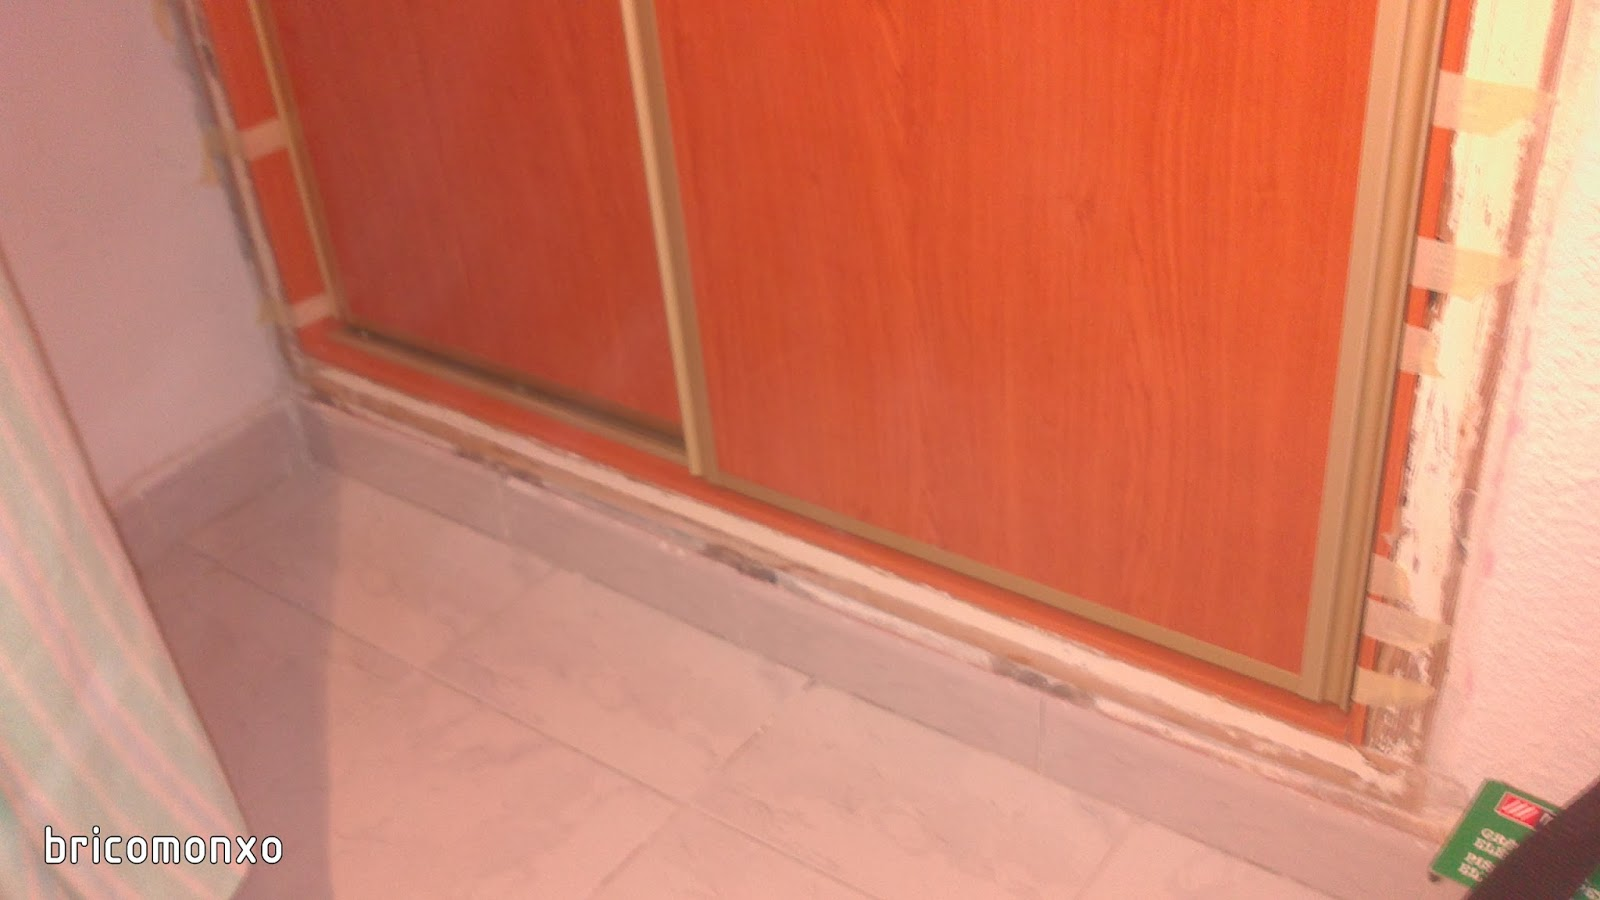 BRICOMONXO: Armario empotrado (con puertas correderas)